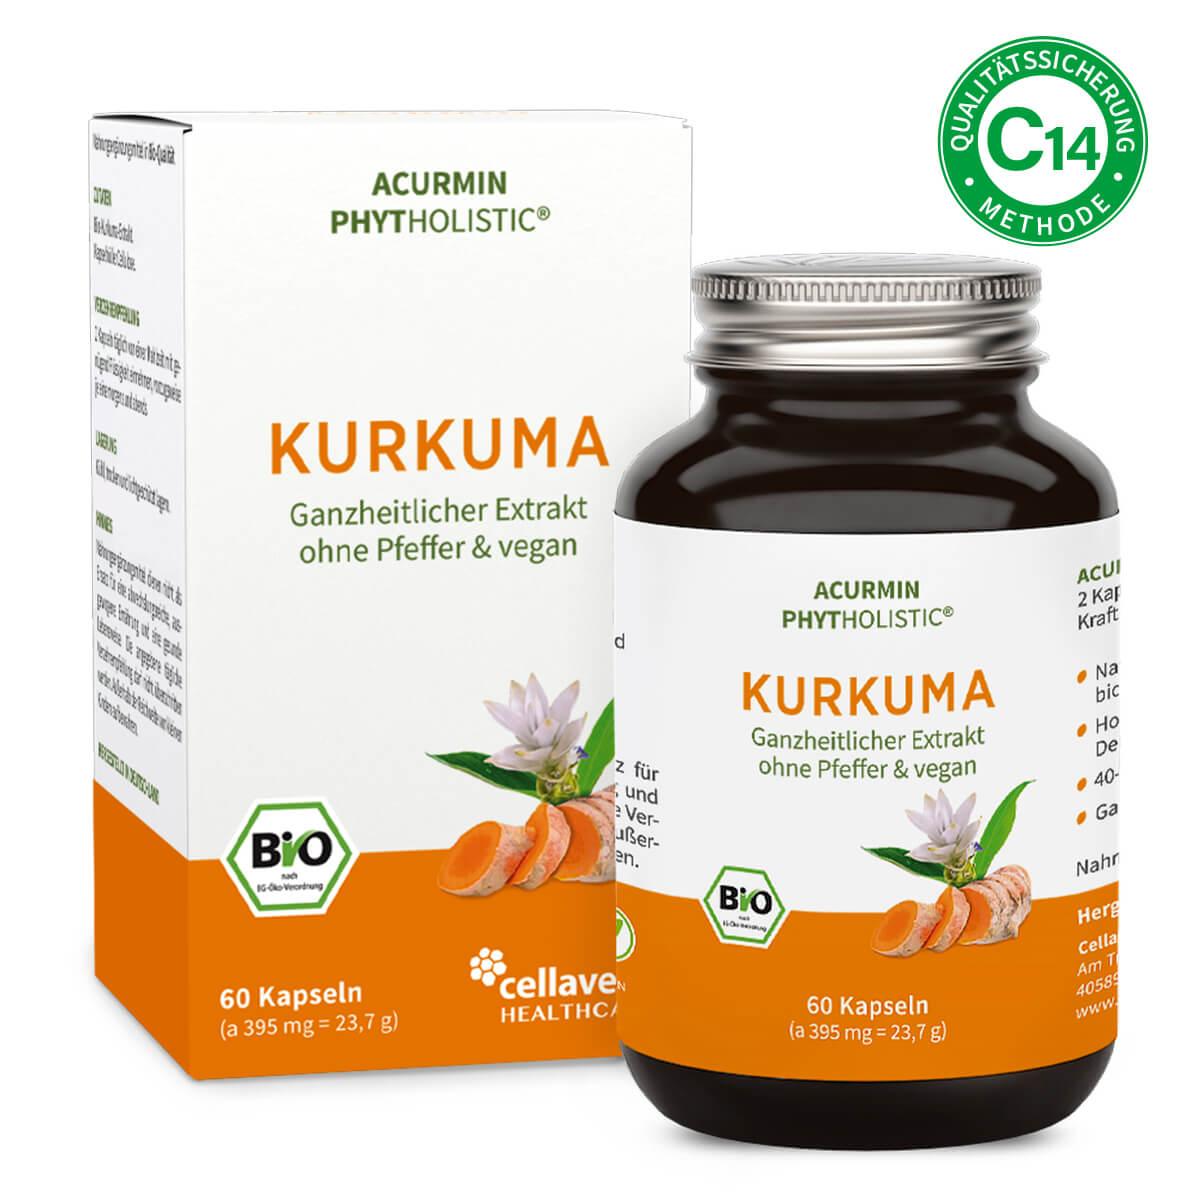 kurkuma-kapseln-bio-acurmin-phytholistic-60-stueck-verpackung-vorne-mit-siegel-1200x1200